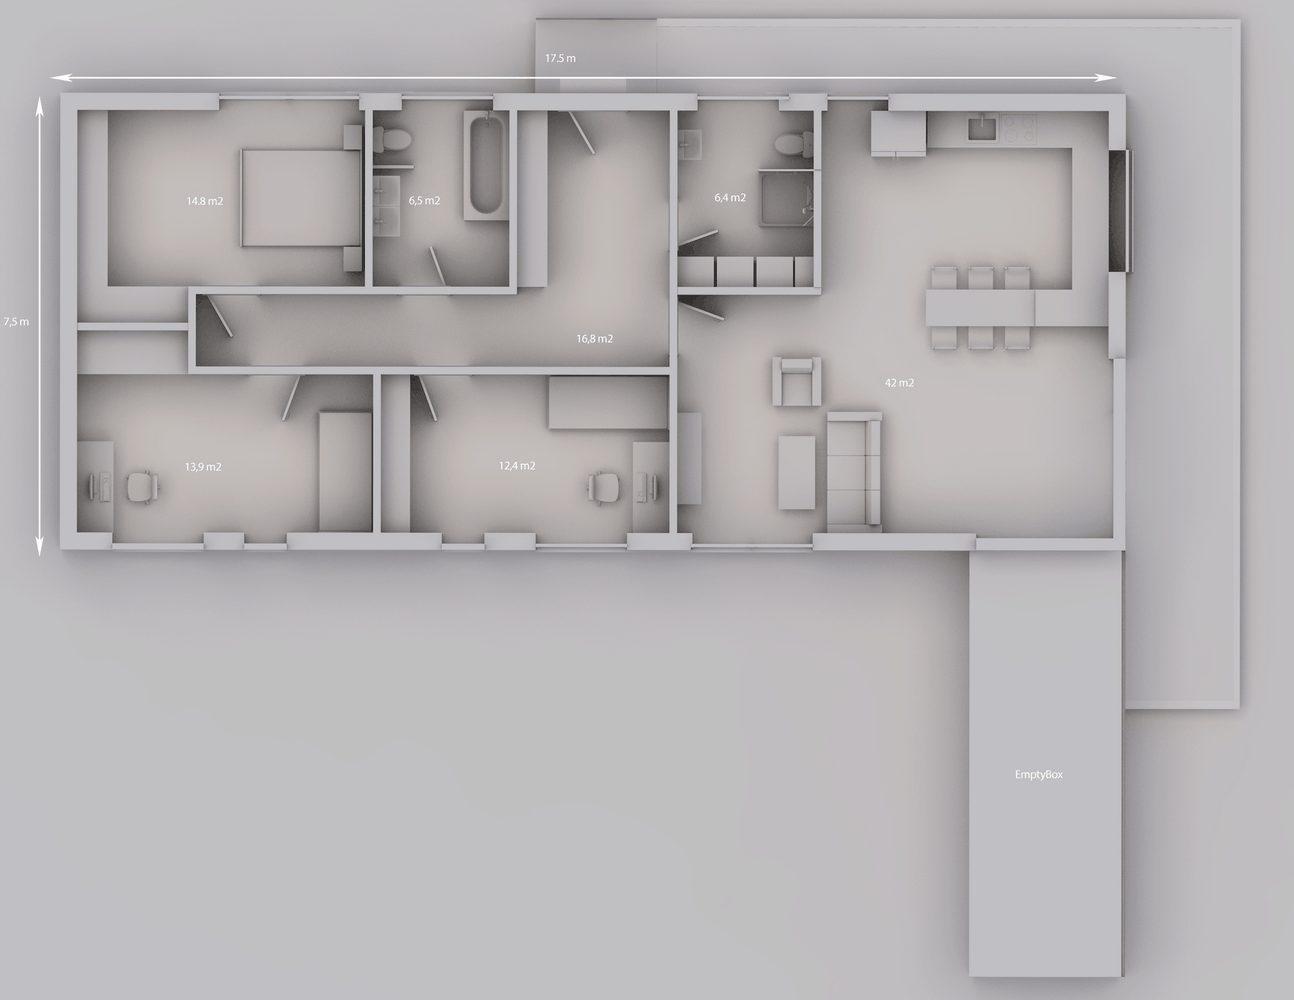 Rodinný dům 131 5+kk 1